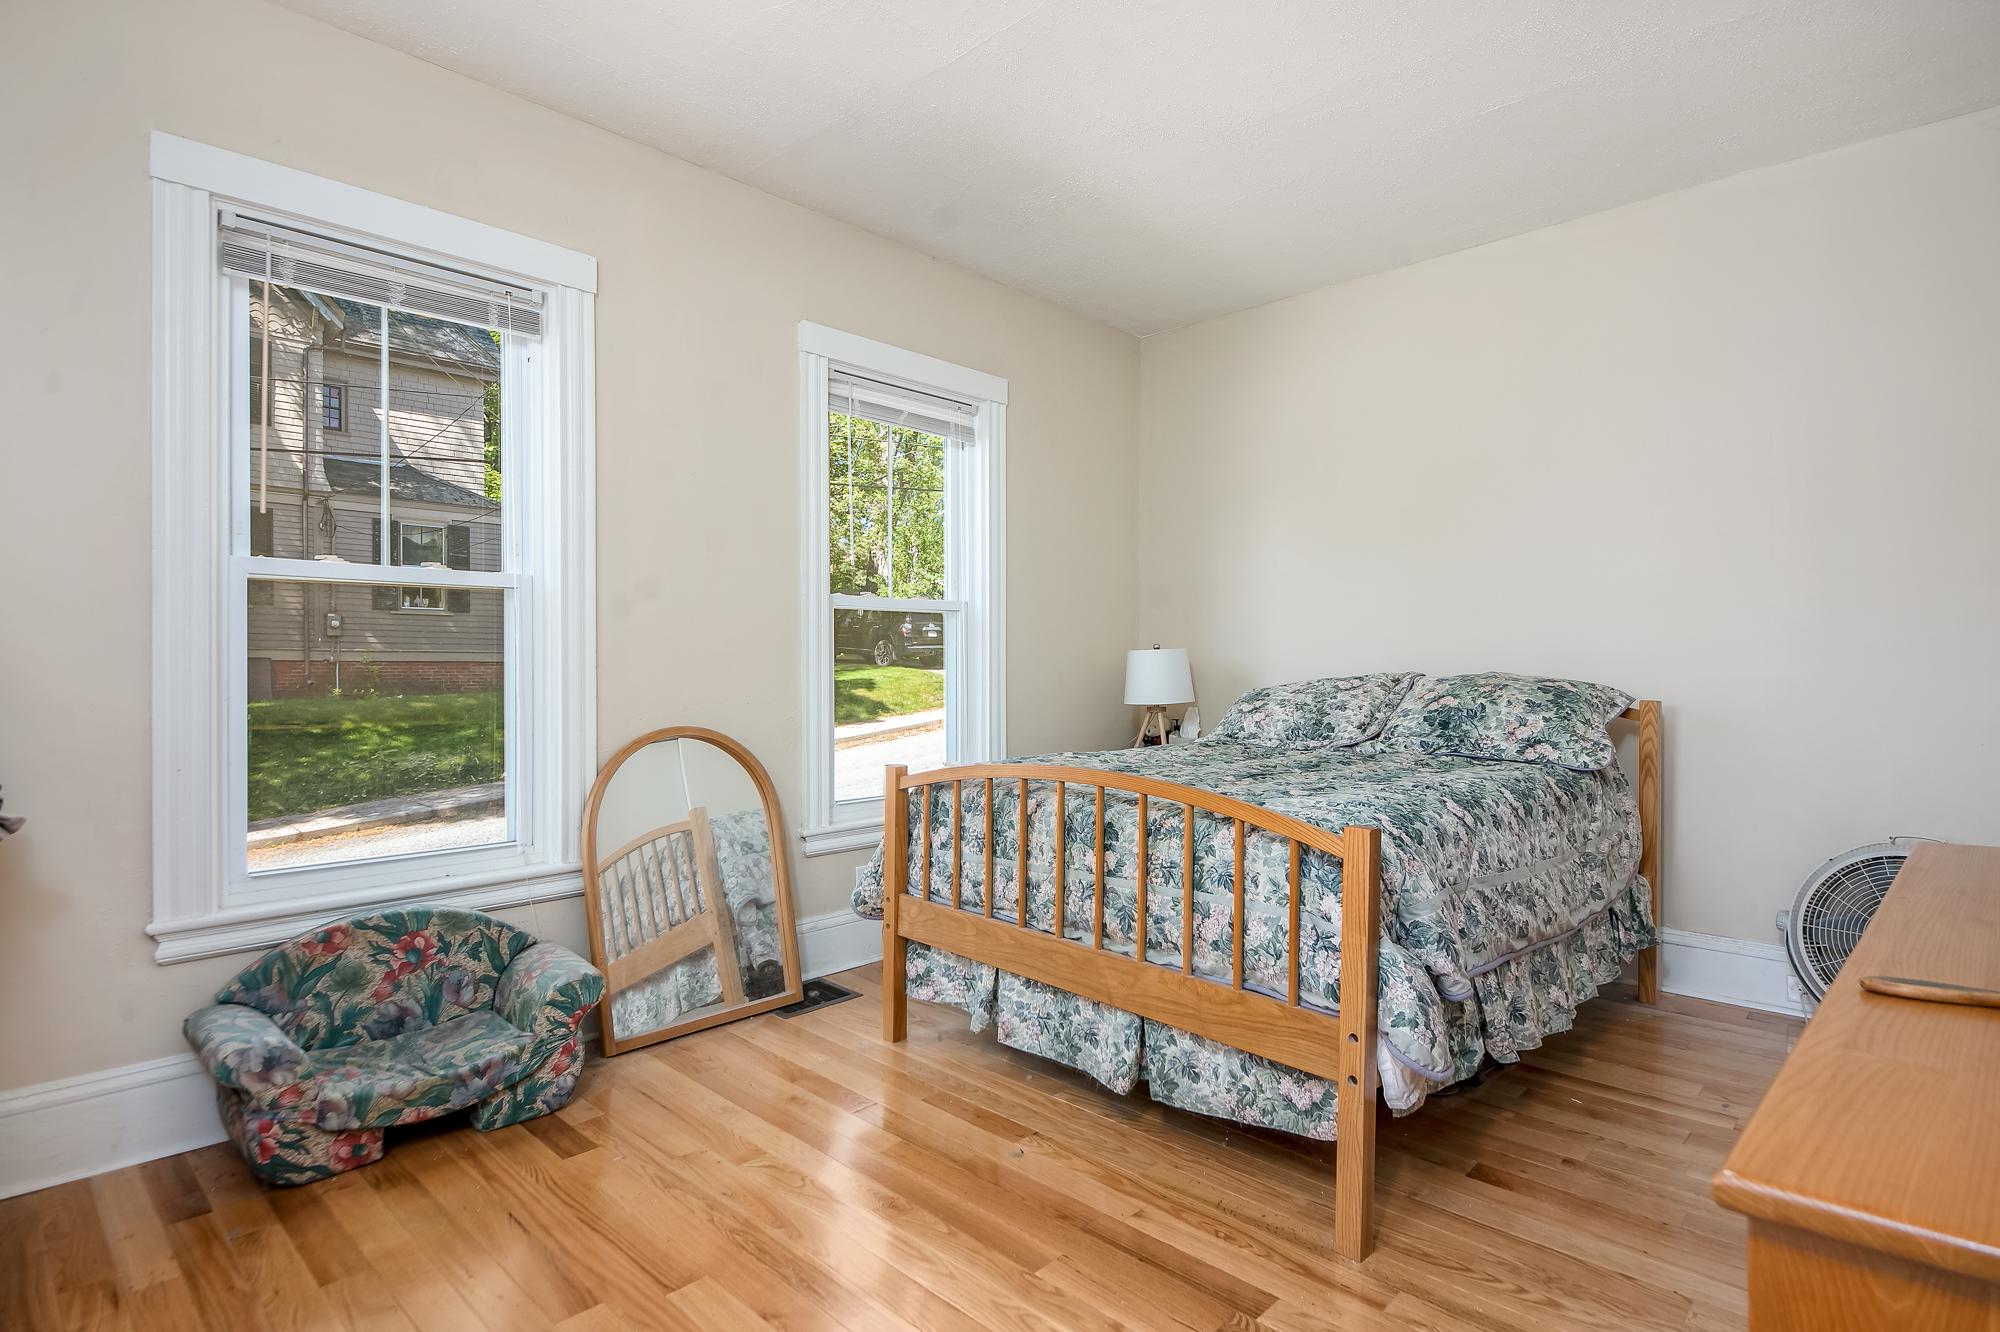 51-53 Prospect-bedroom master7.jpg